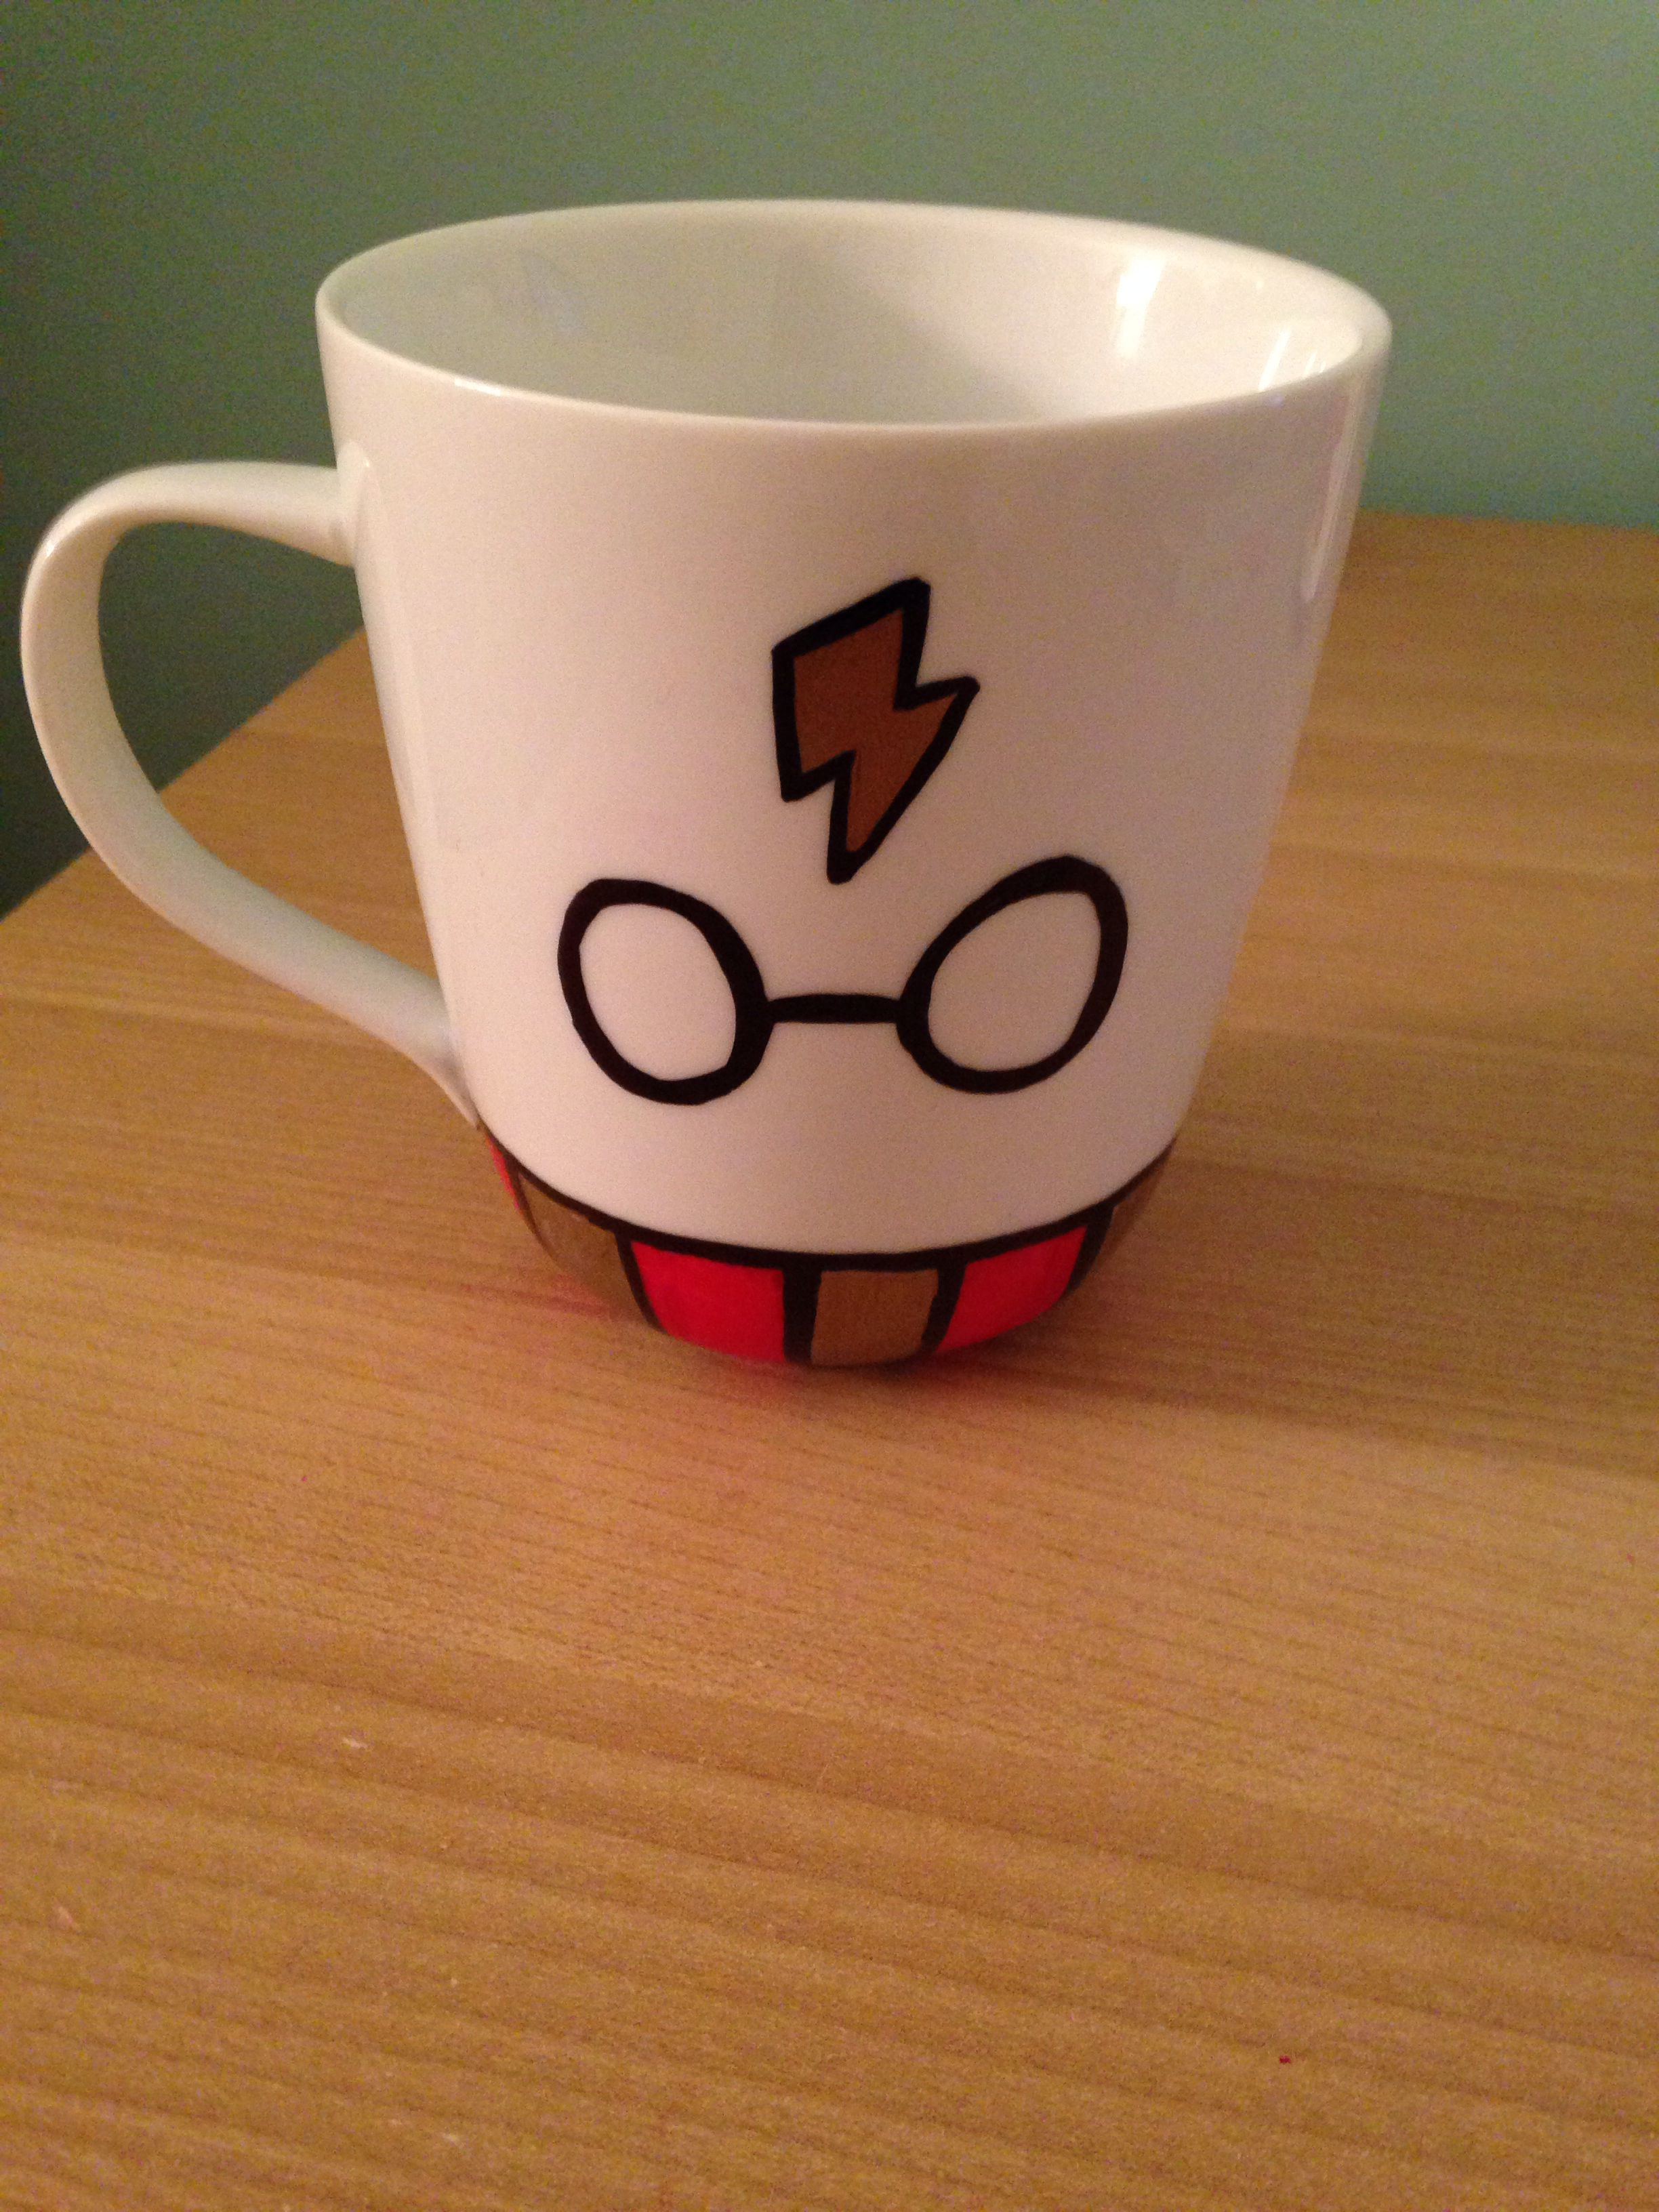 100 Awesome Diy Coffee Mug Art Creations